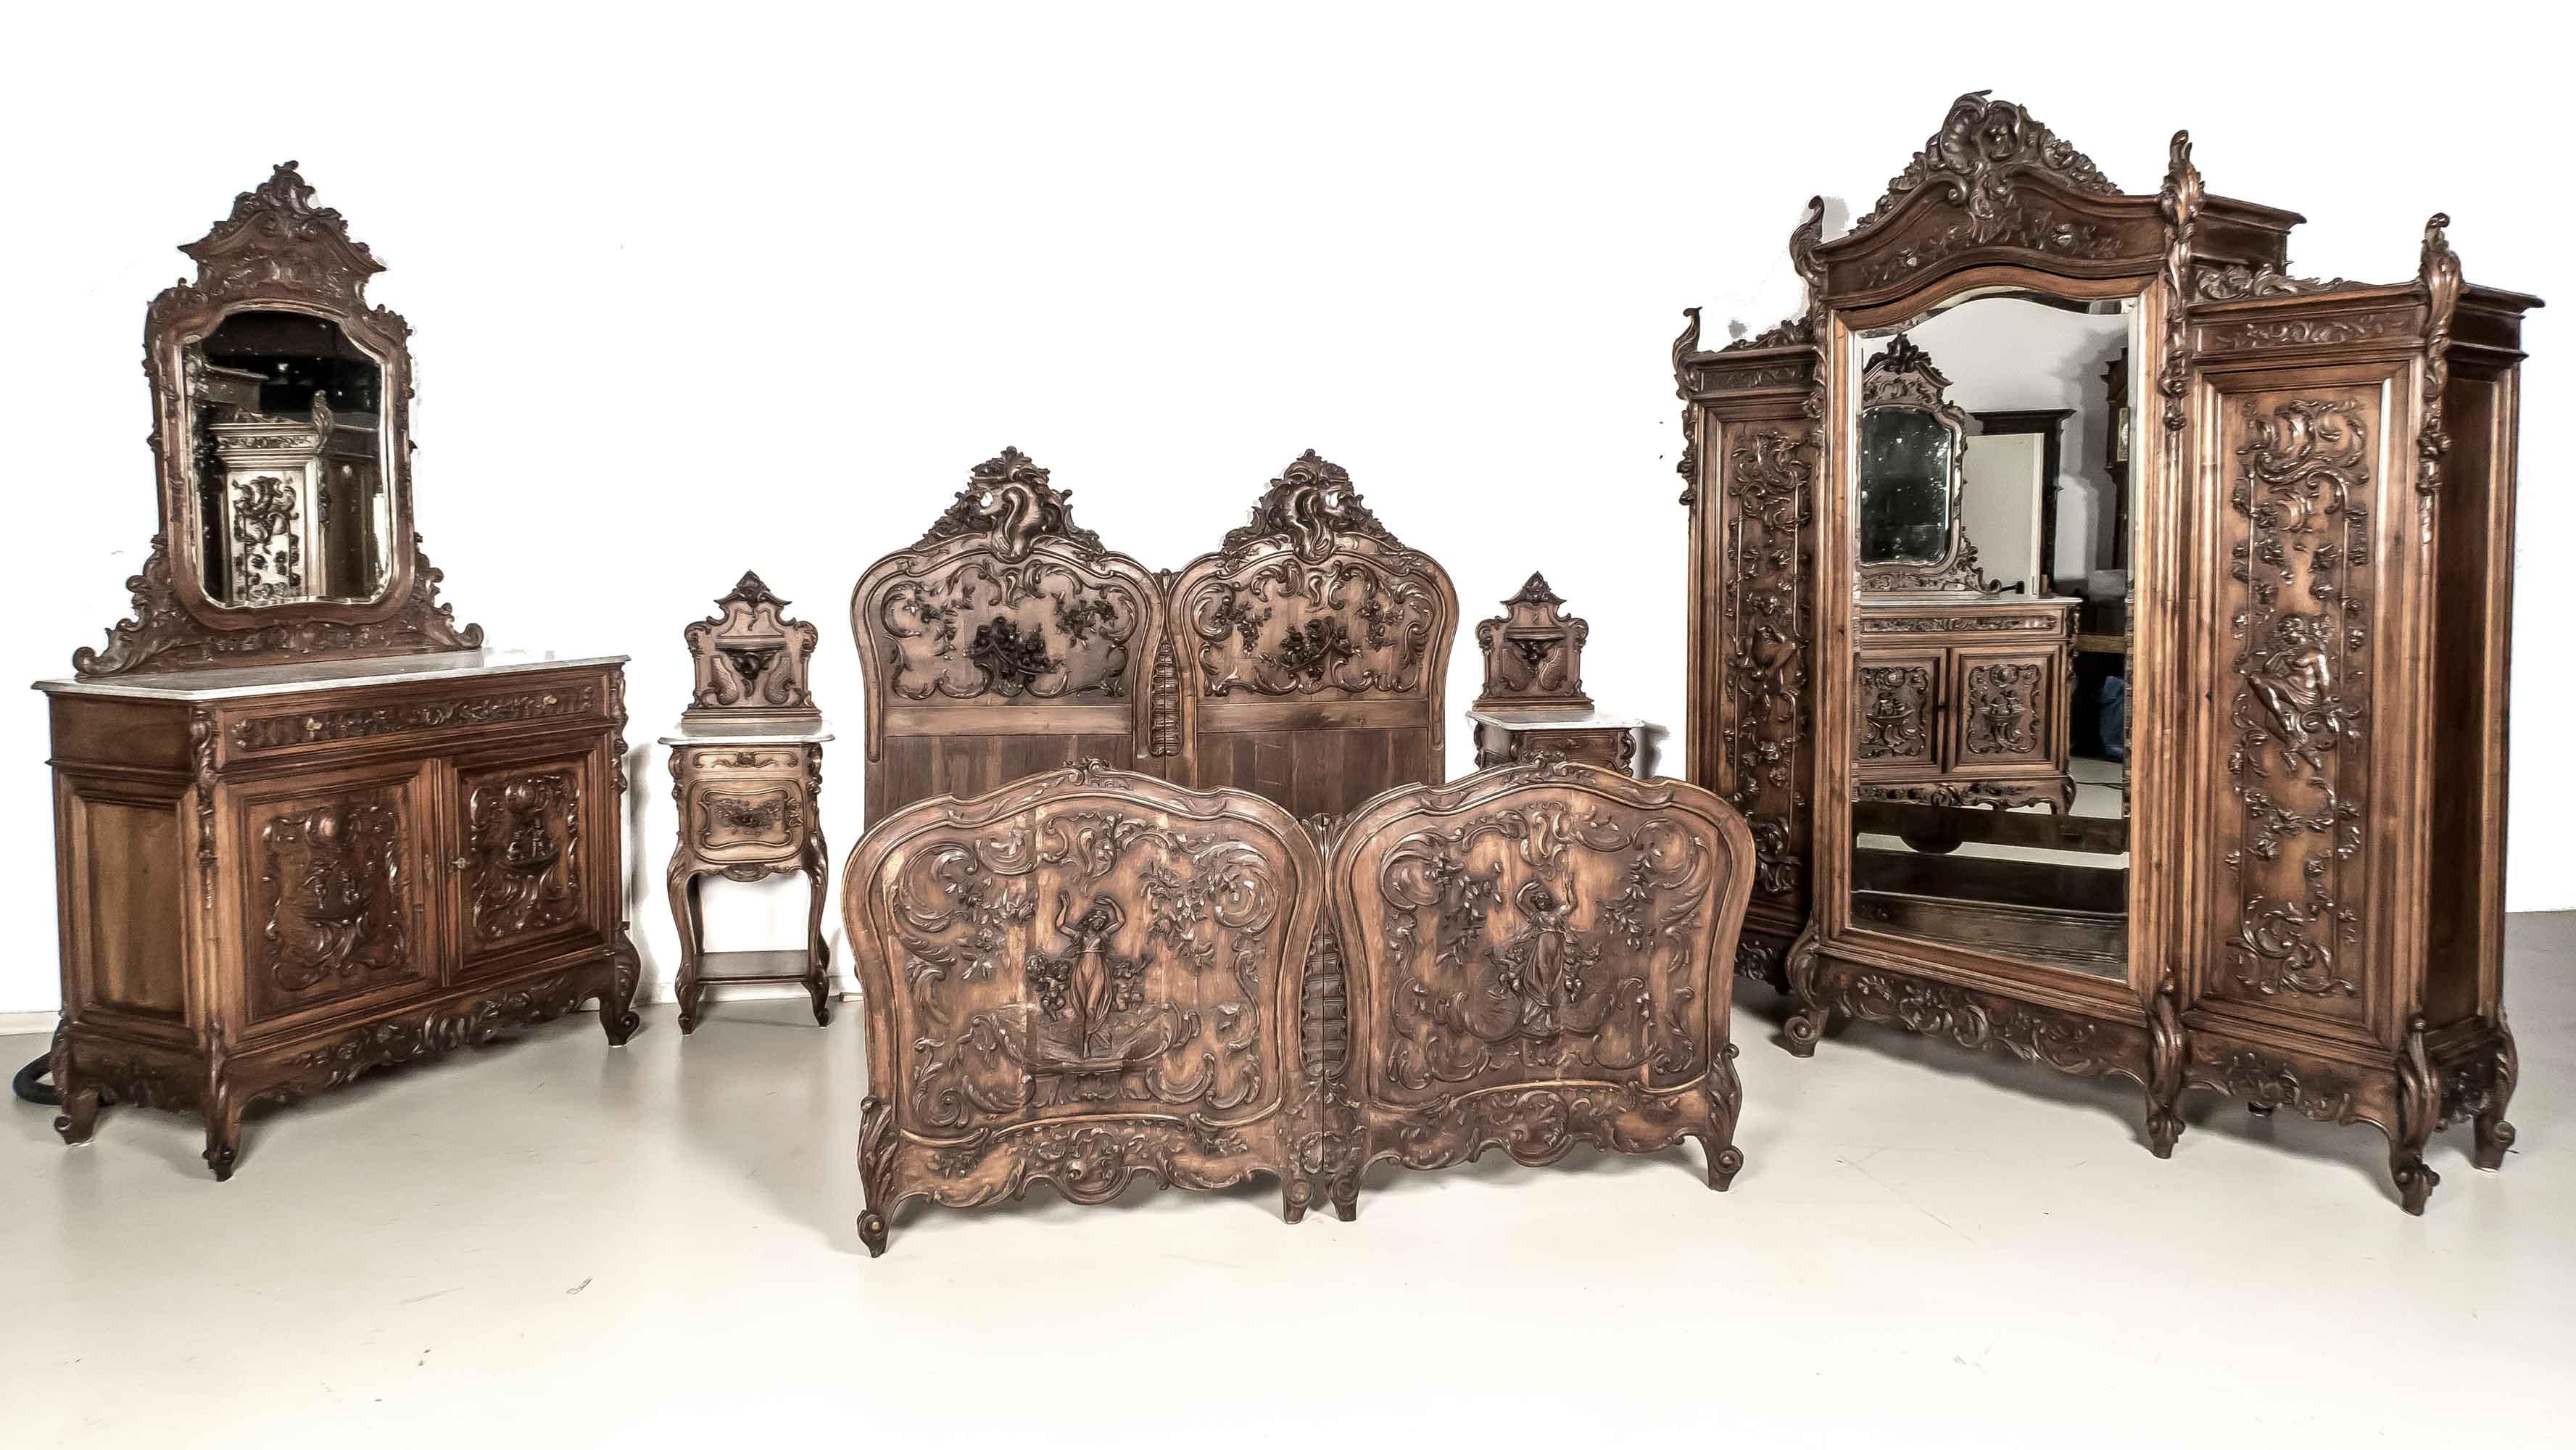 komplettes schlafzimmer auktion historia auktionshaus. Black Bedroom Furniture Sets. Home Design Ideas